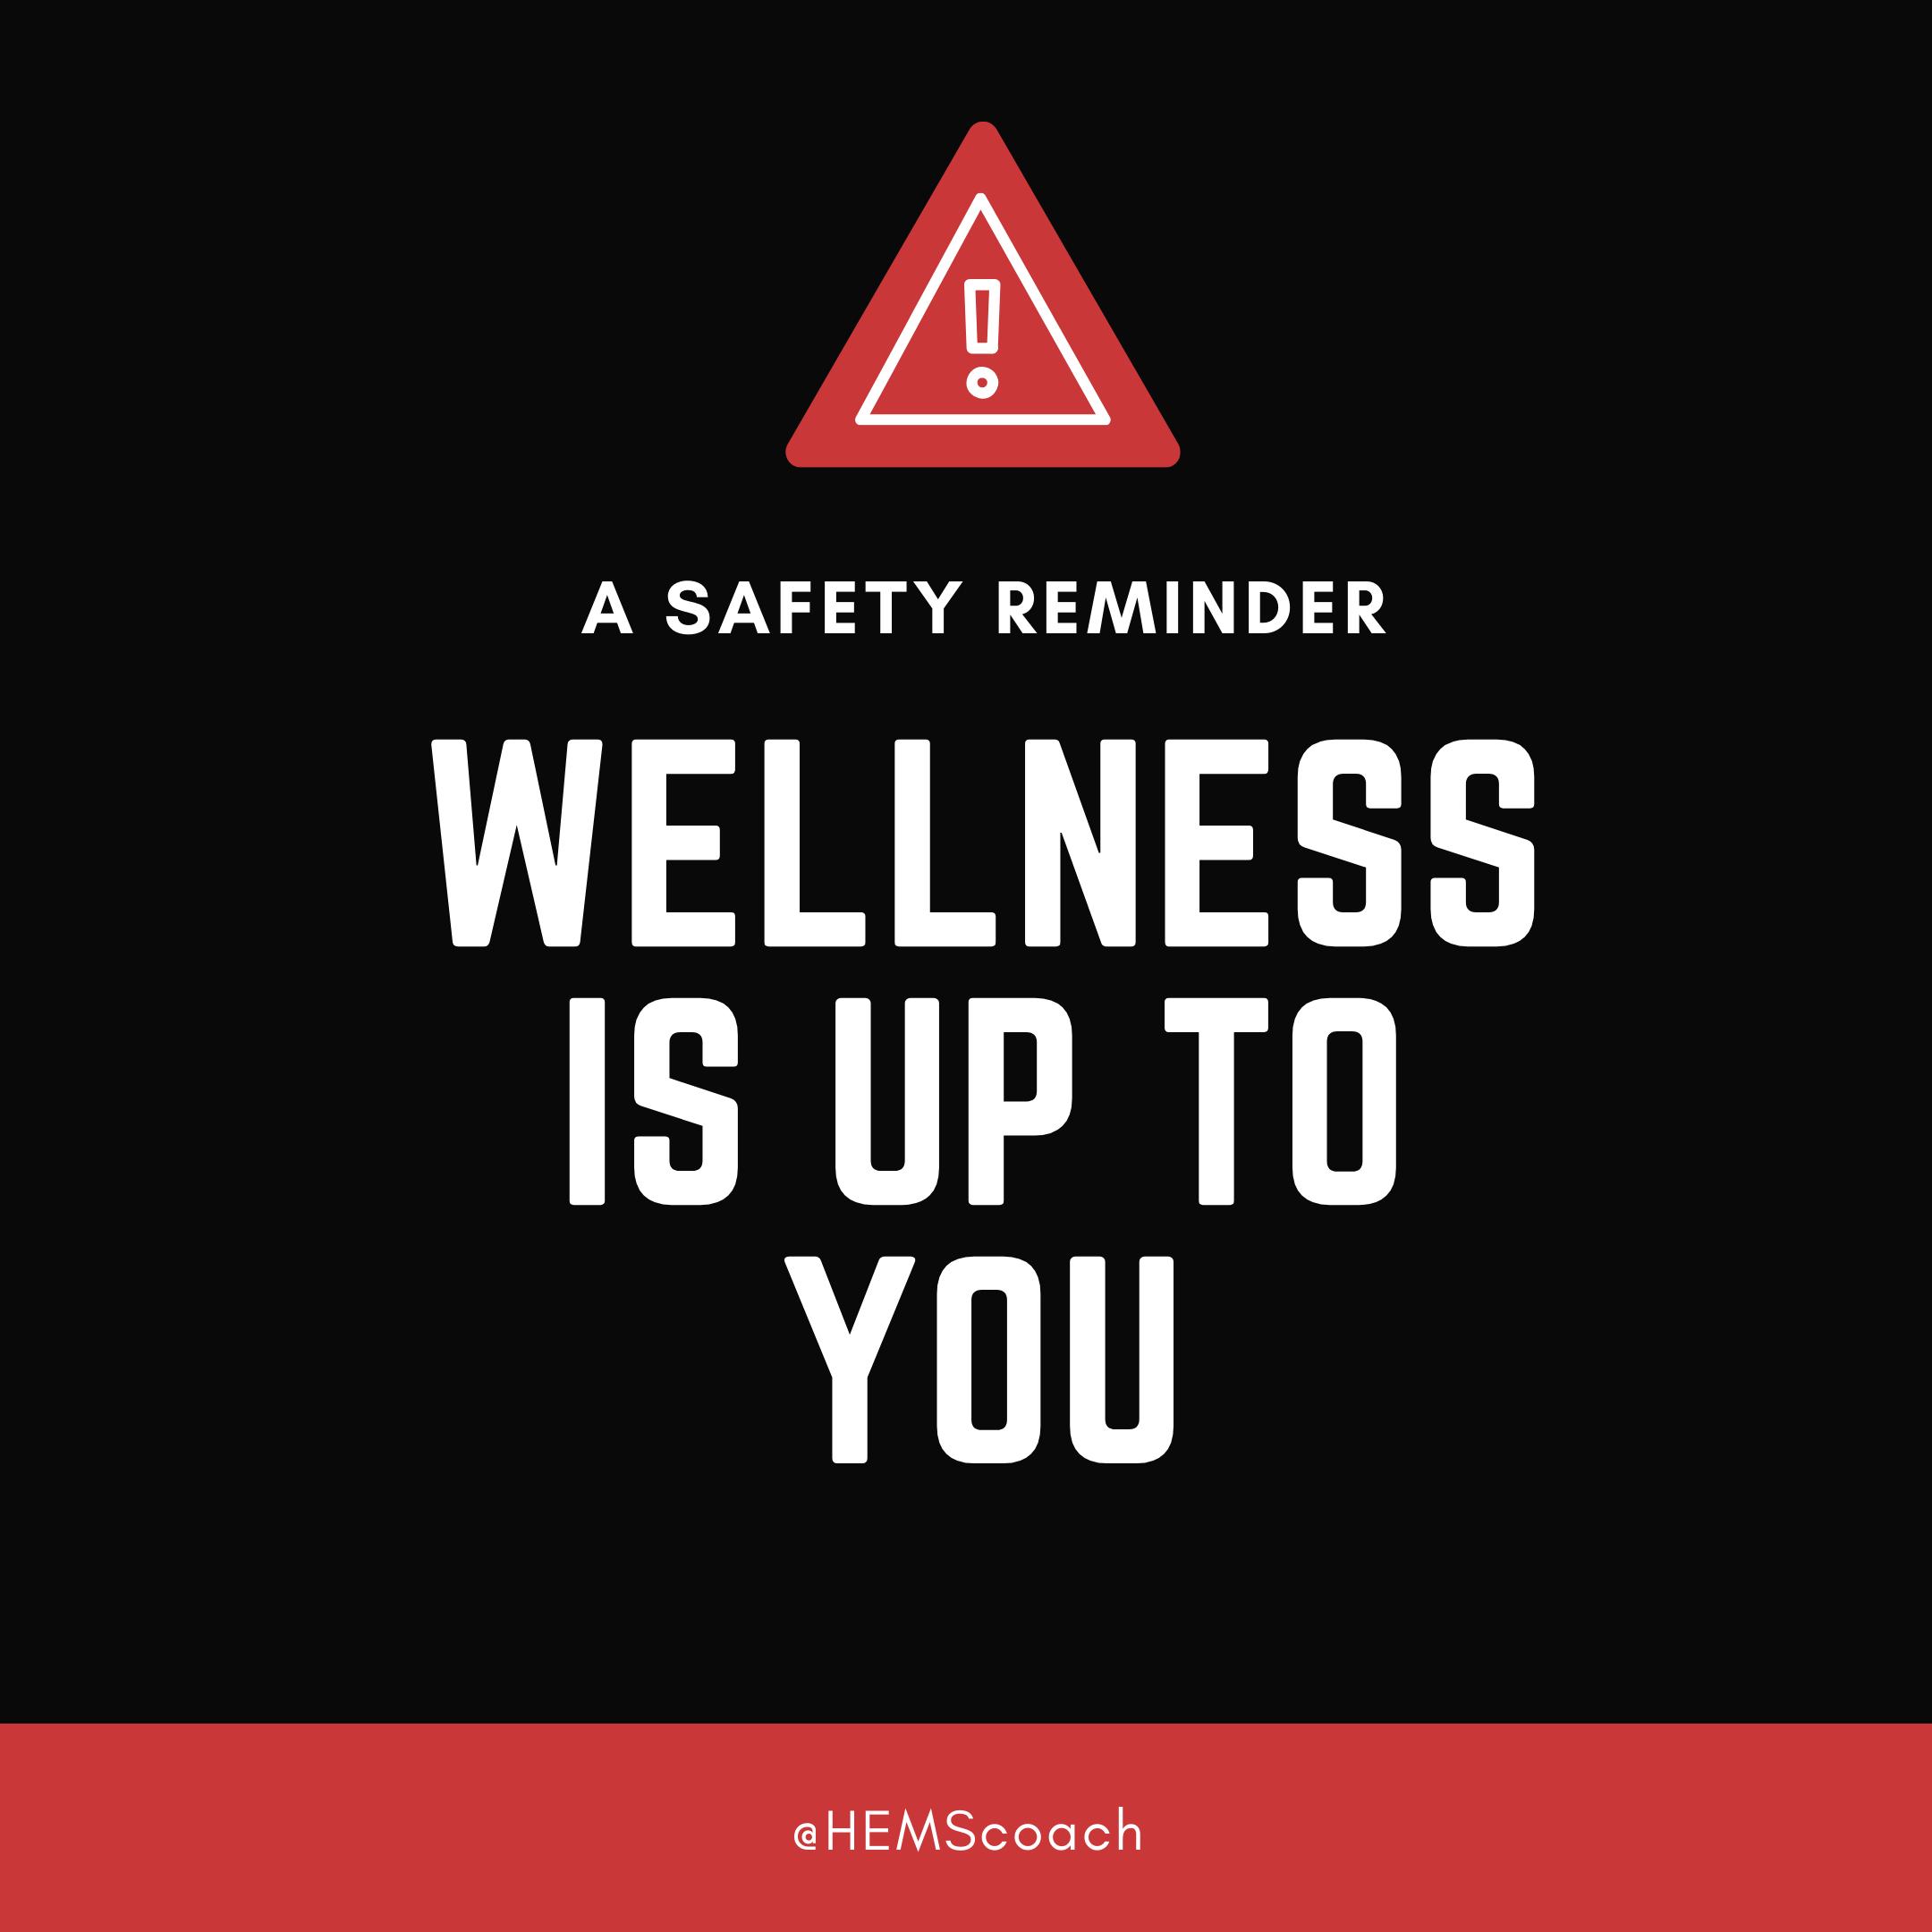 Safety Reminder